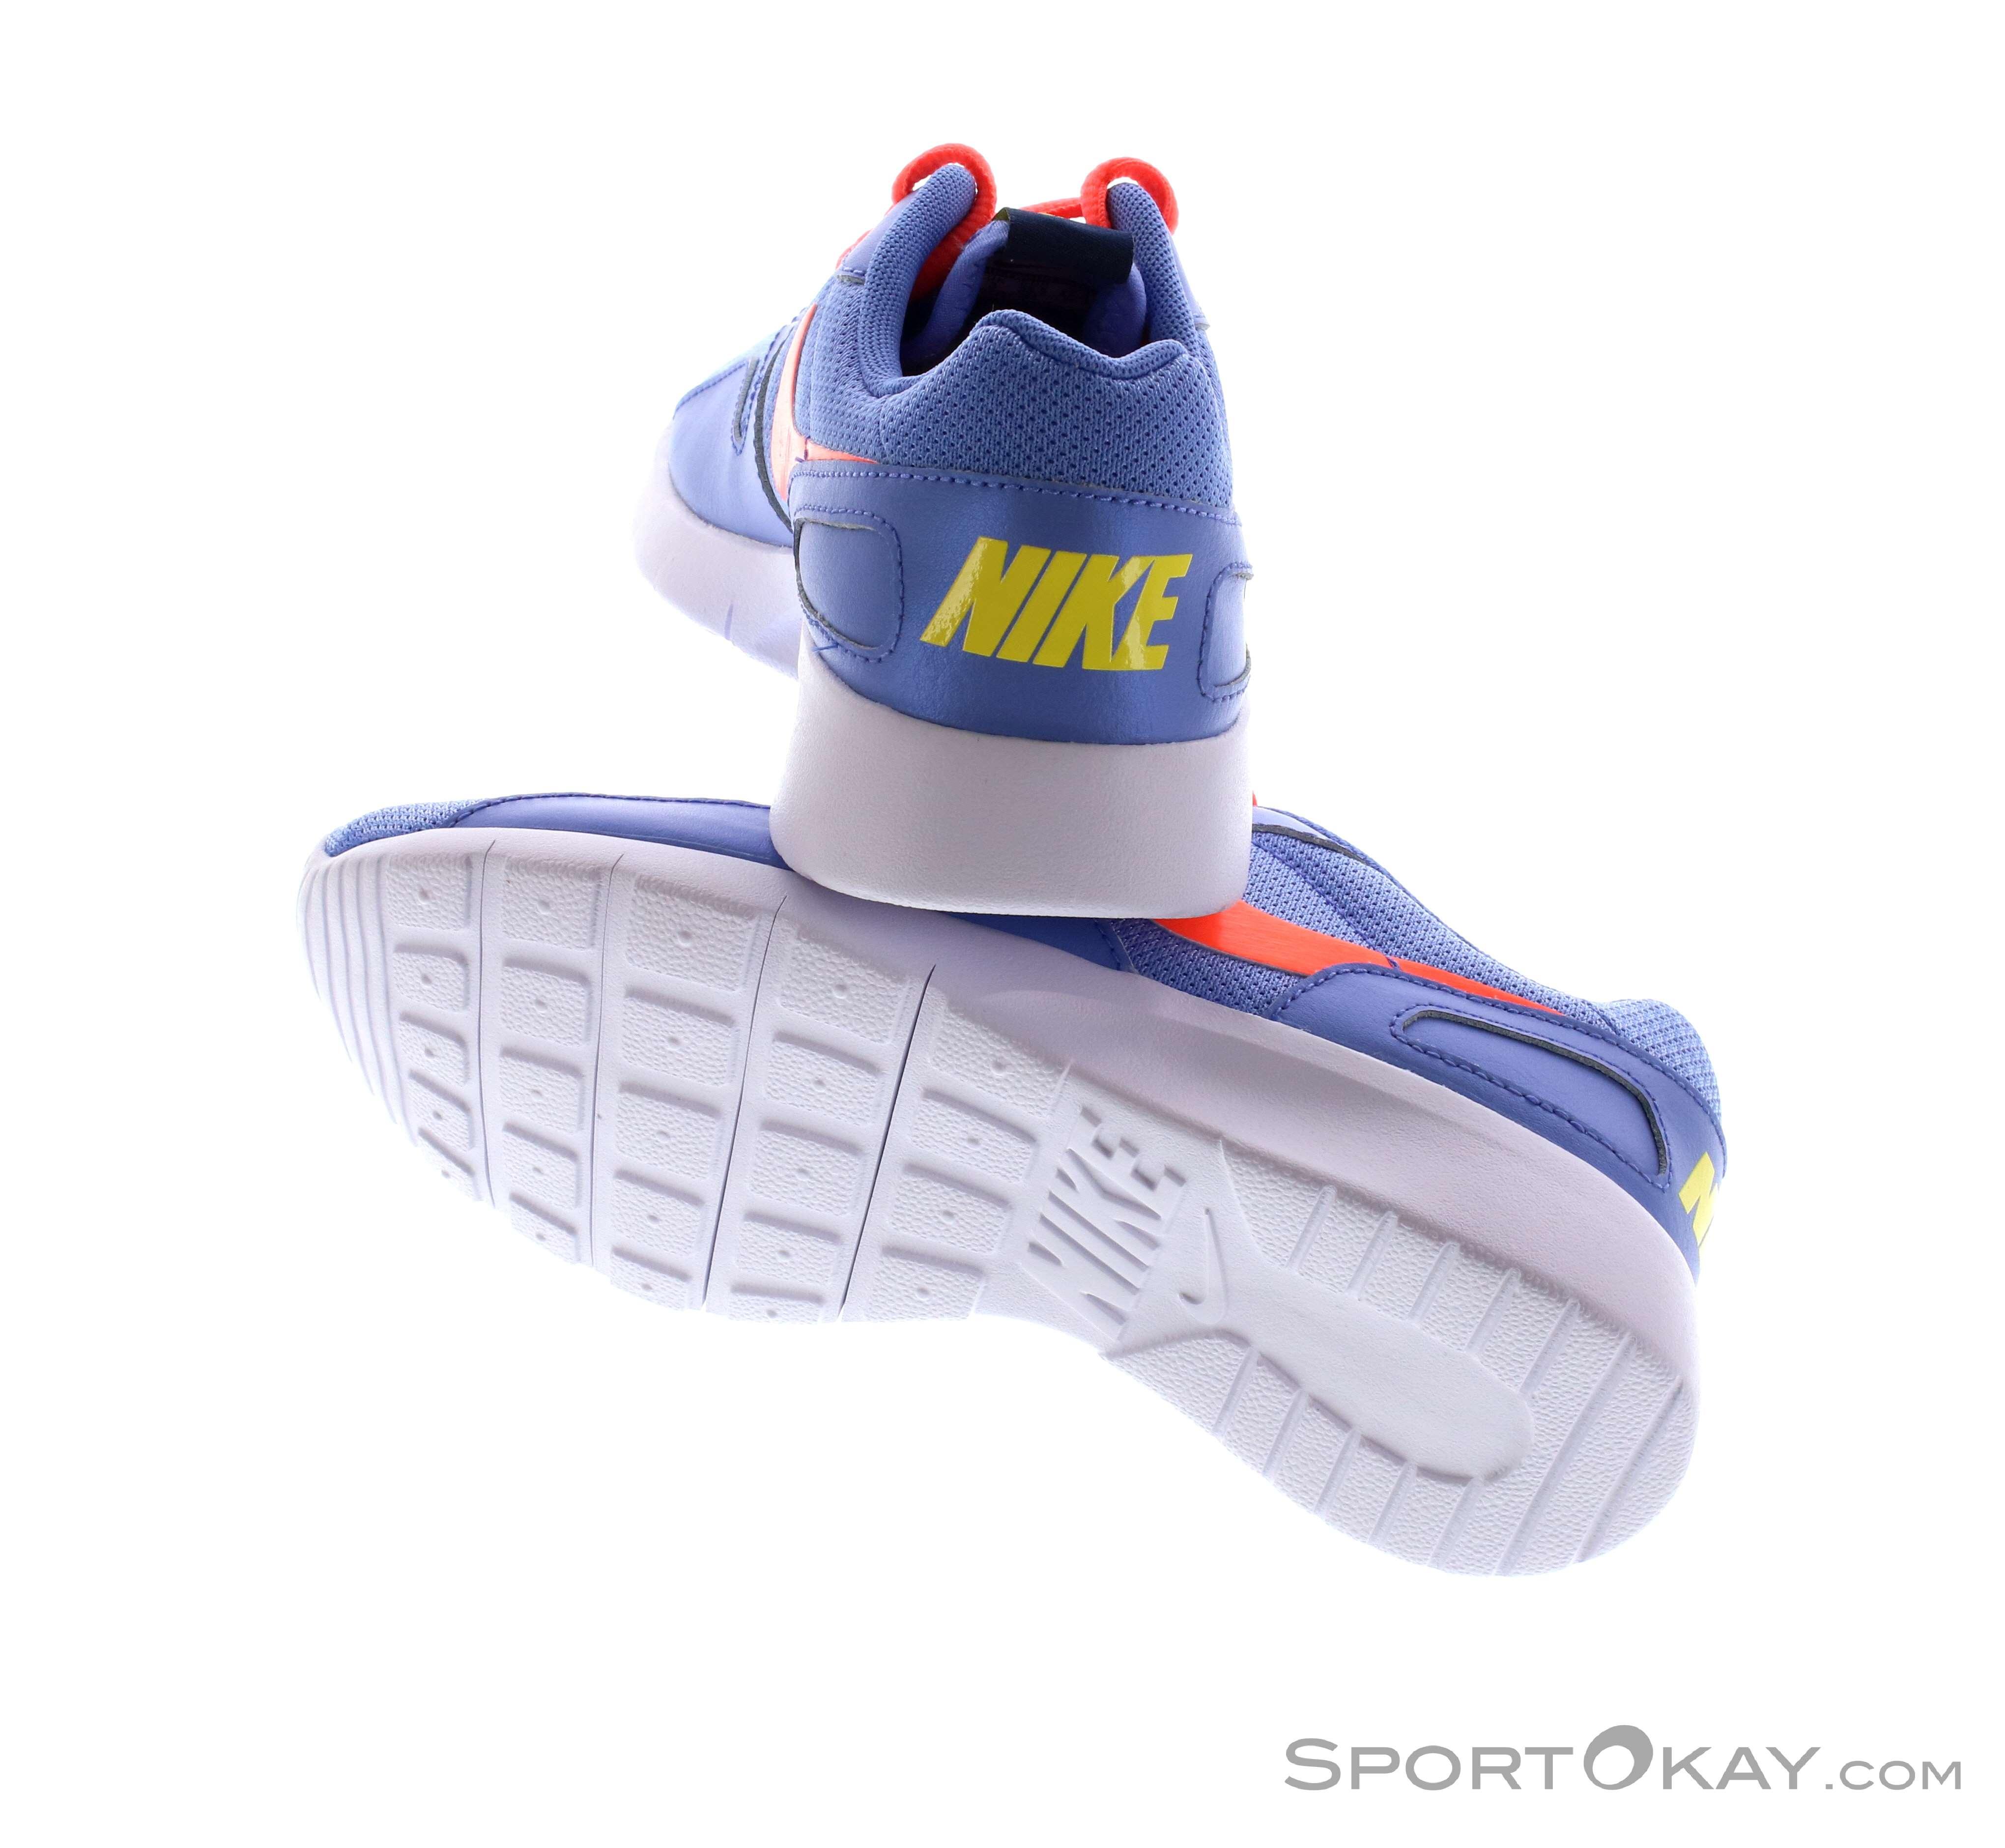 Nike Nike Kaishi GS Mädchen Freizeitschuhe